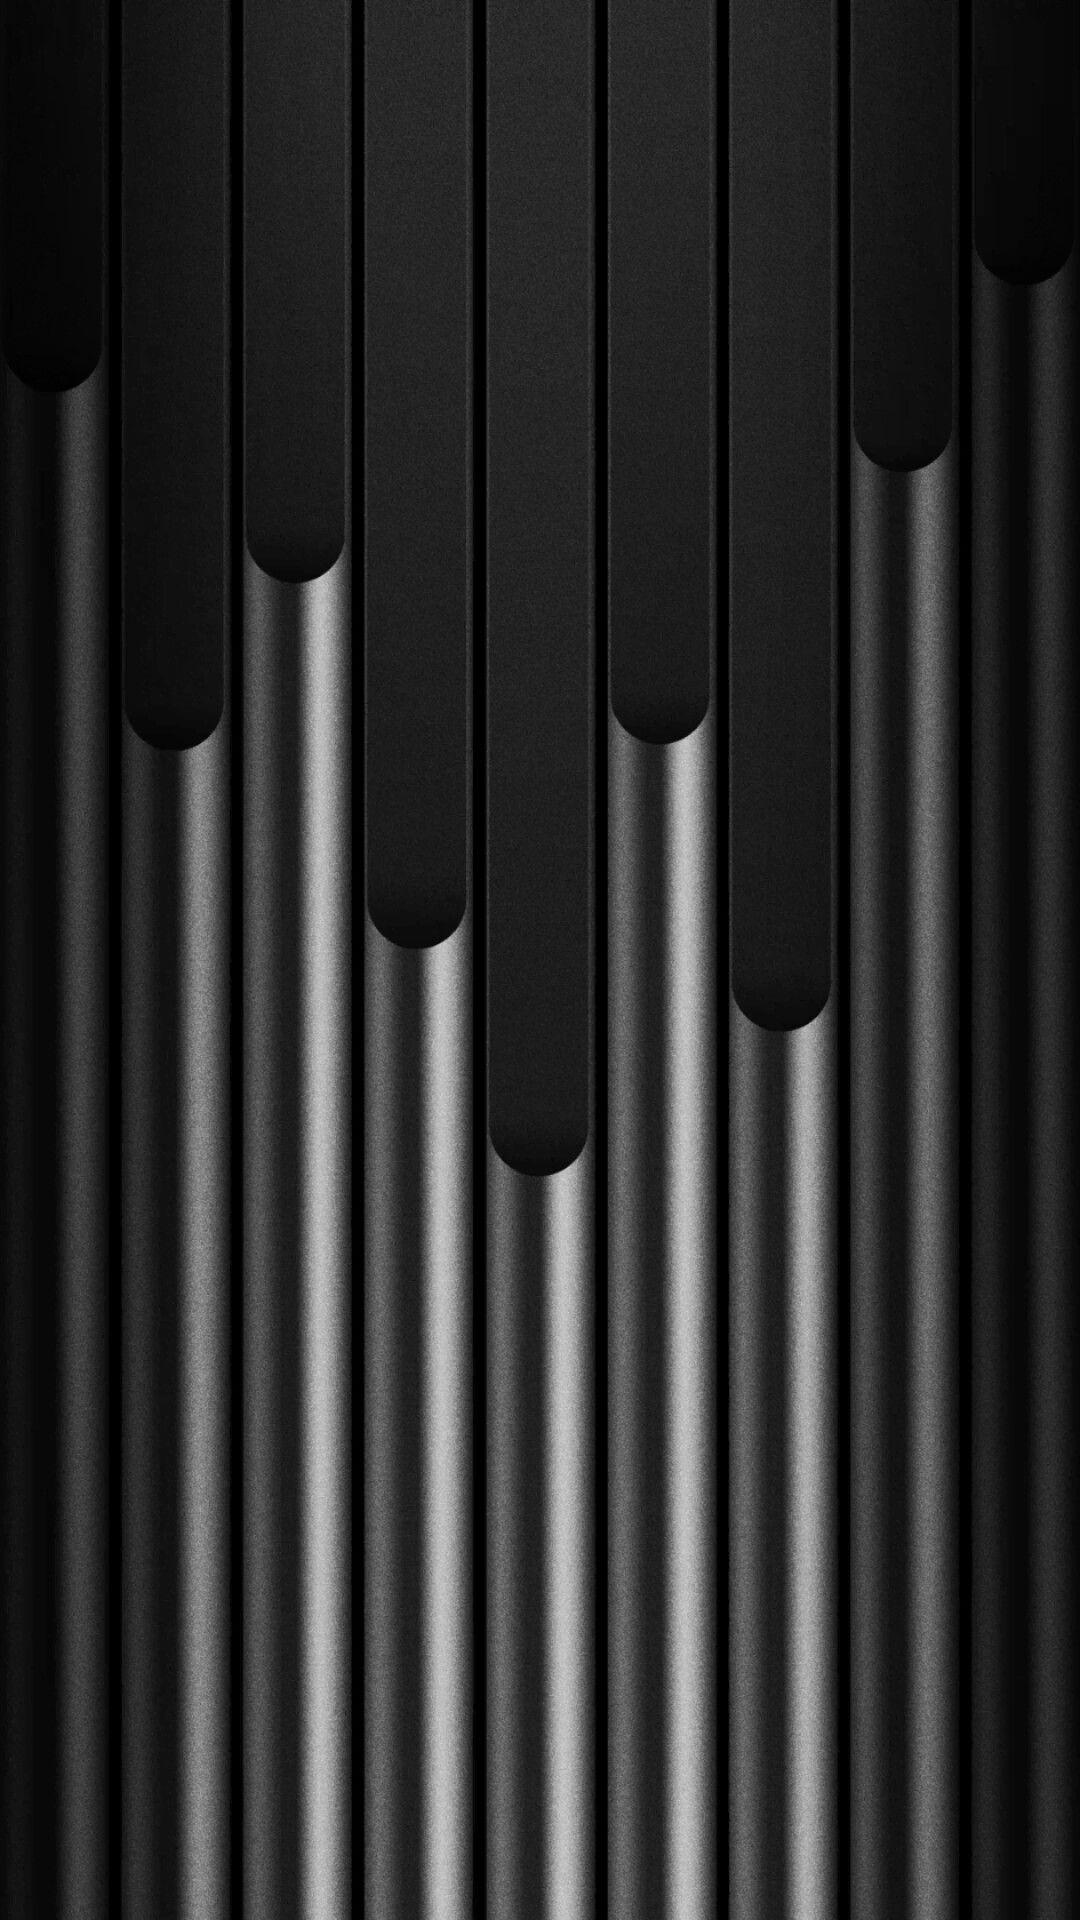 Pin by NikklaDesigns on Tło czarne i szare / Black and